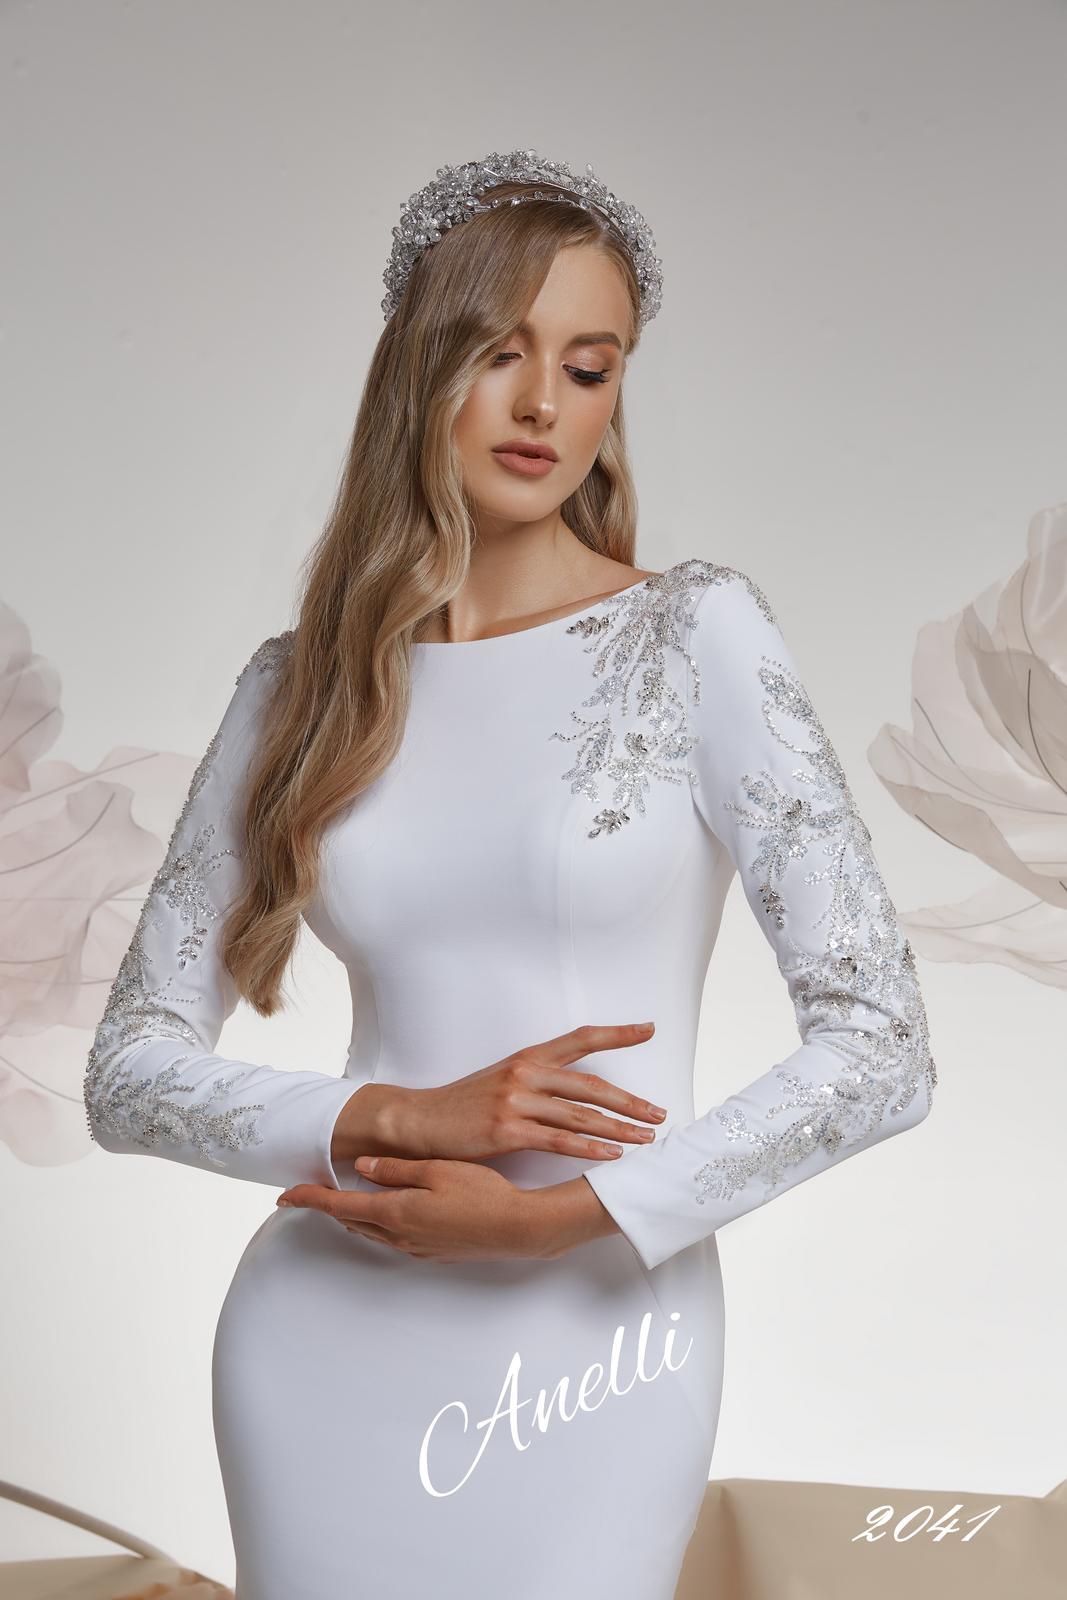 Svadobné šaty - Imagine 2041 - Obrázok č. 2